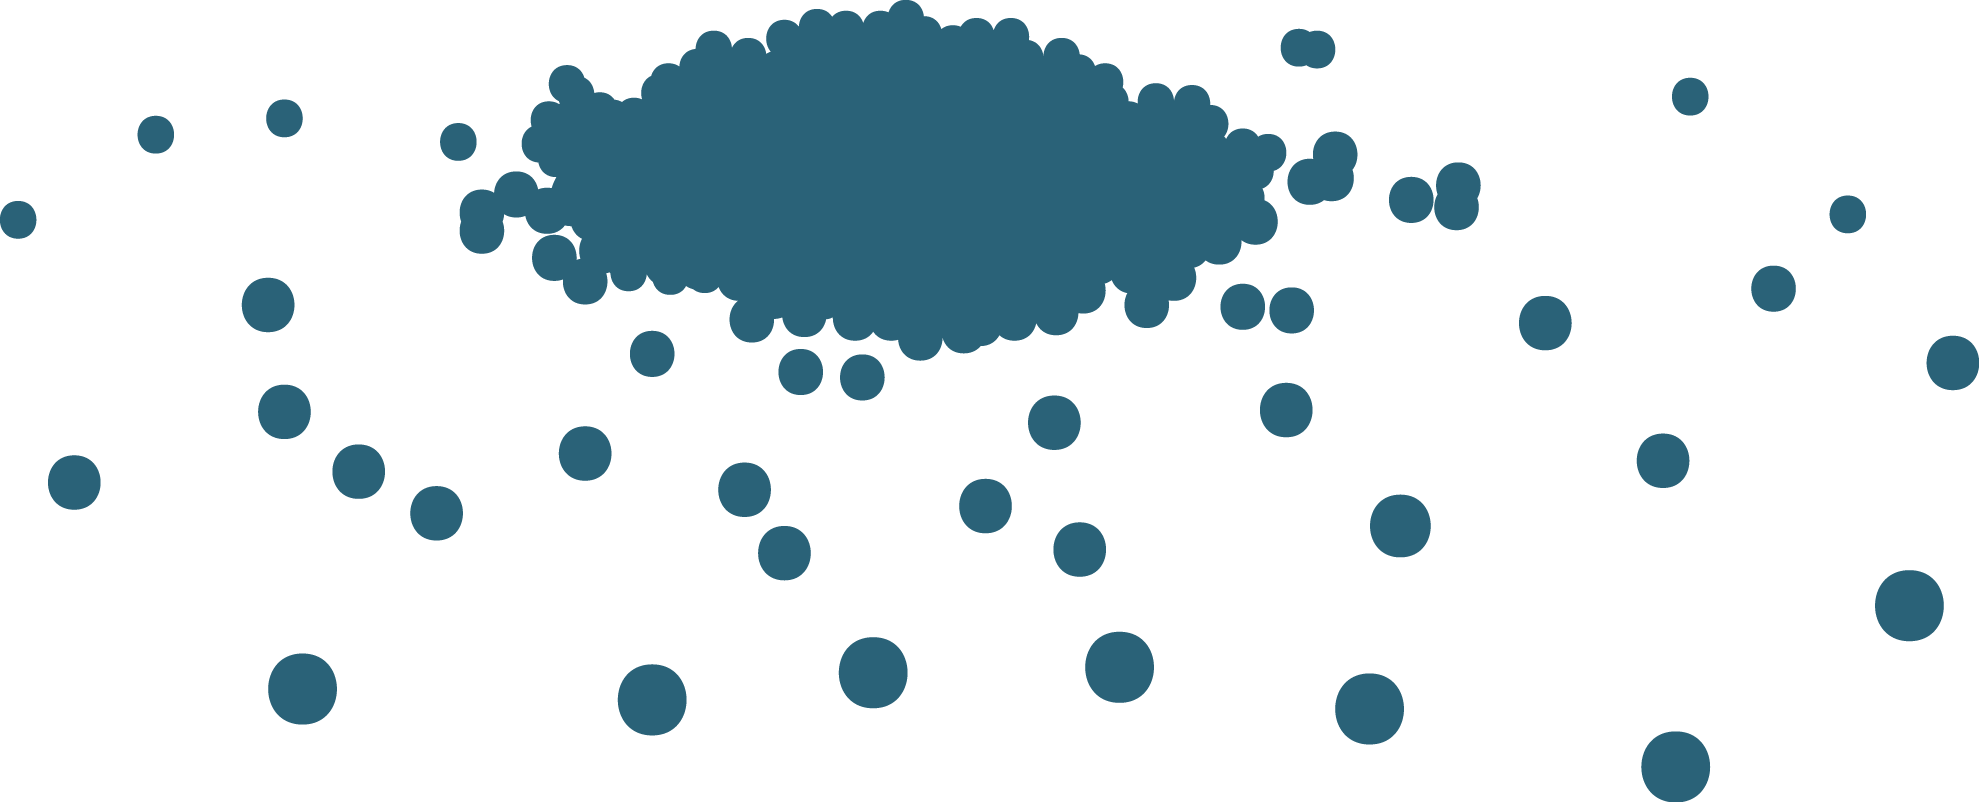 PEEK Granules Icon